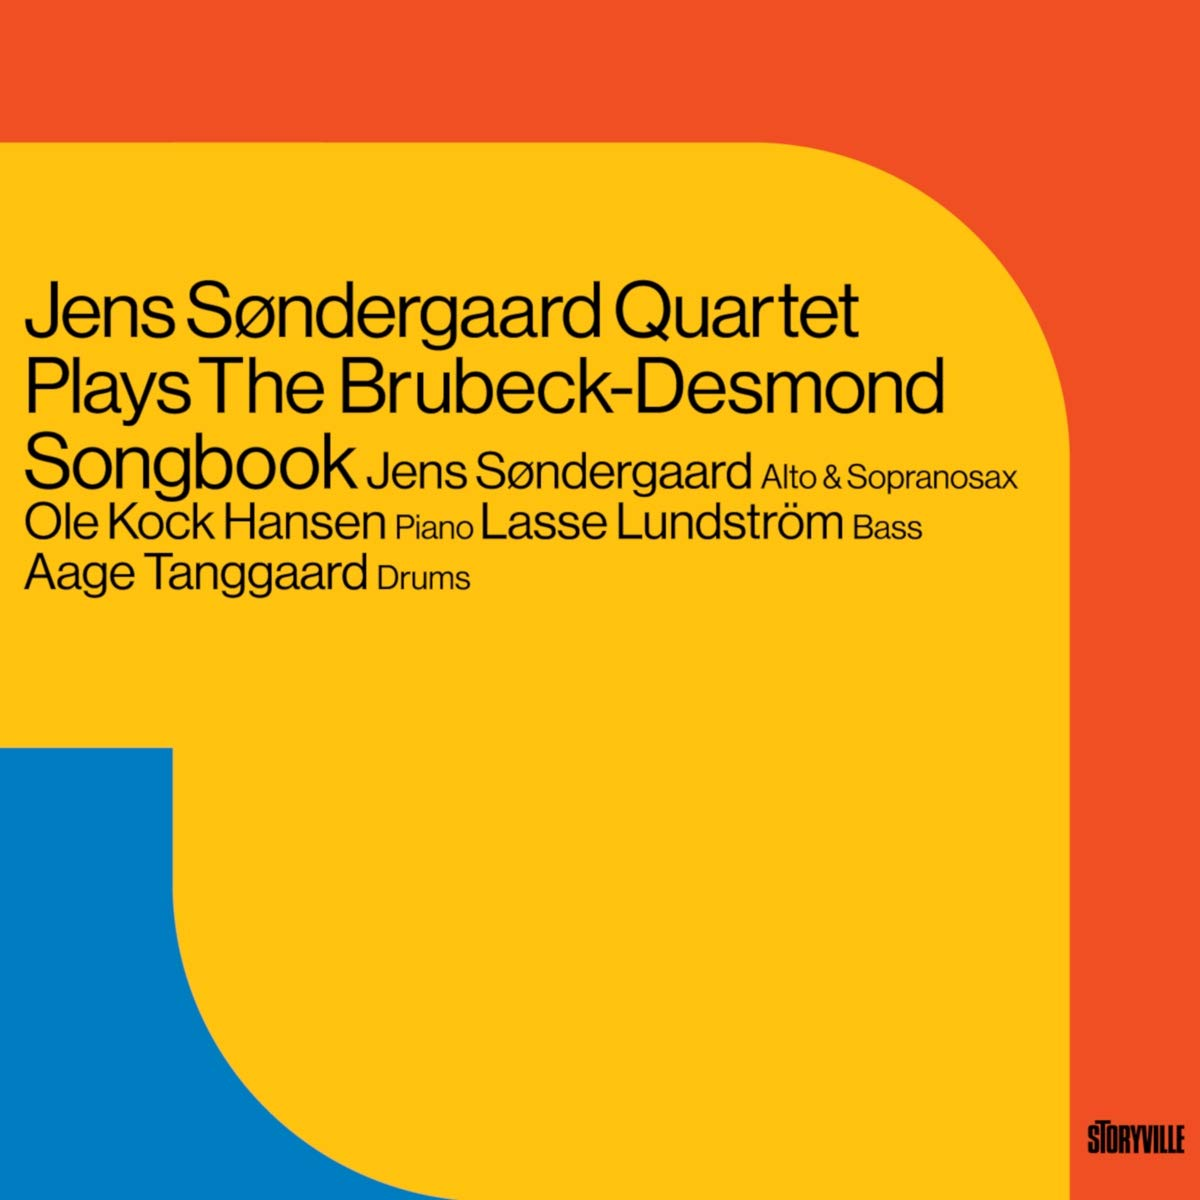 Sale Special Price Brubeck-Desmond Japan's largest assortment Songbook